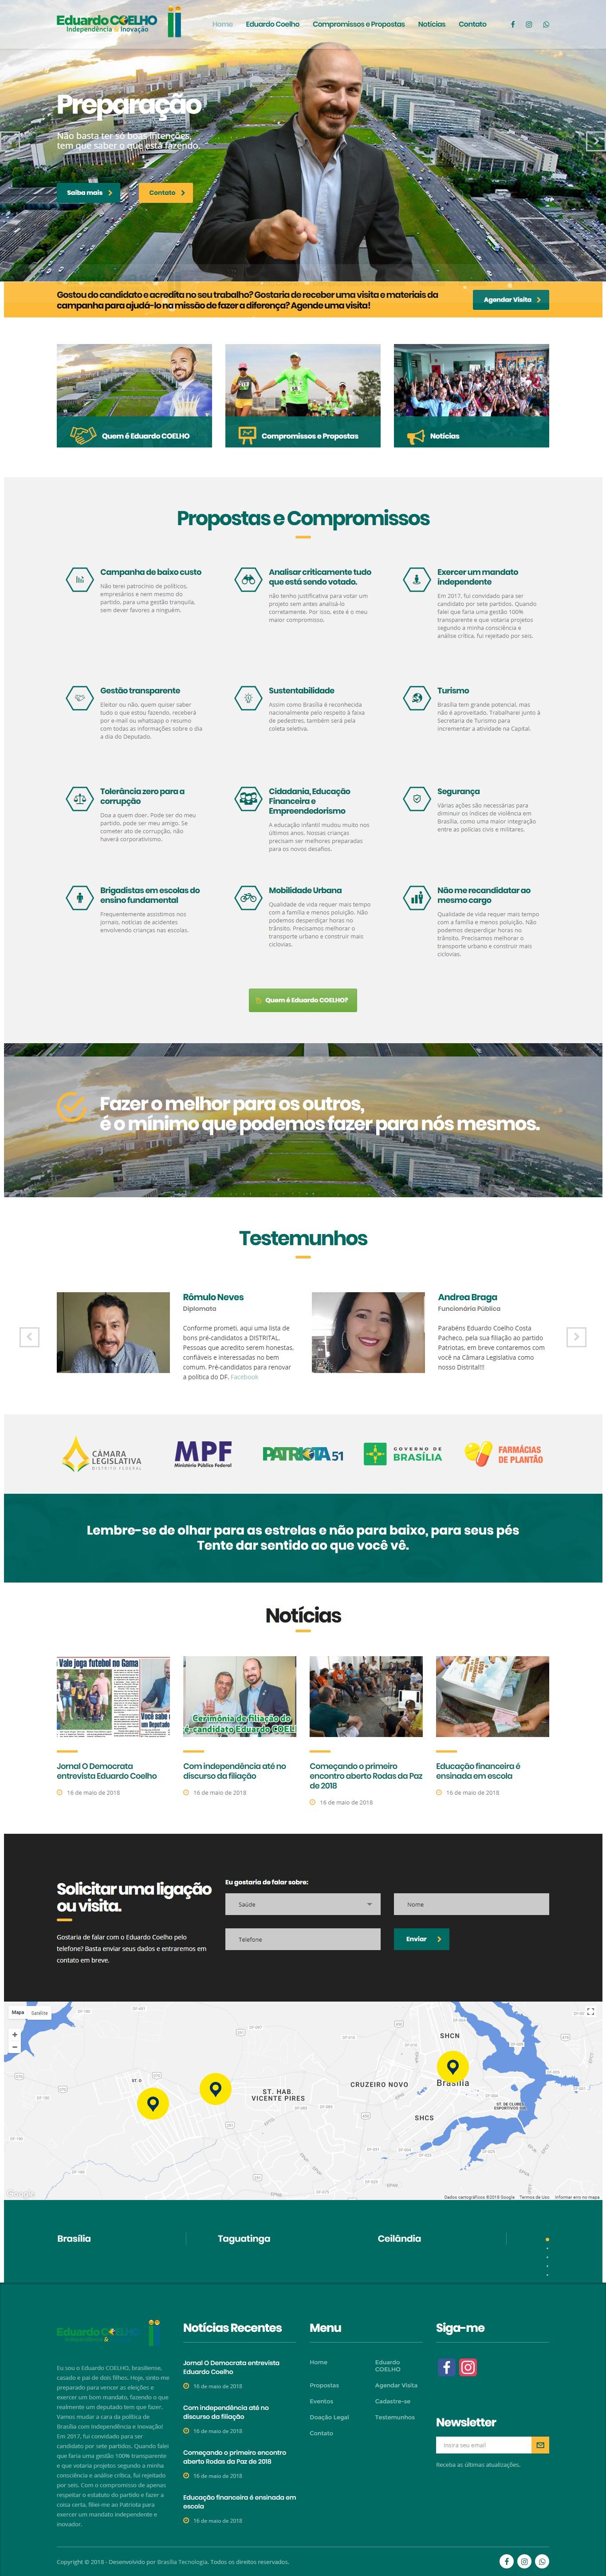 Eduardo Coelho eduardocoelhodf.com.br-brasilia-tecnologia-IT